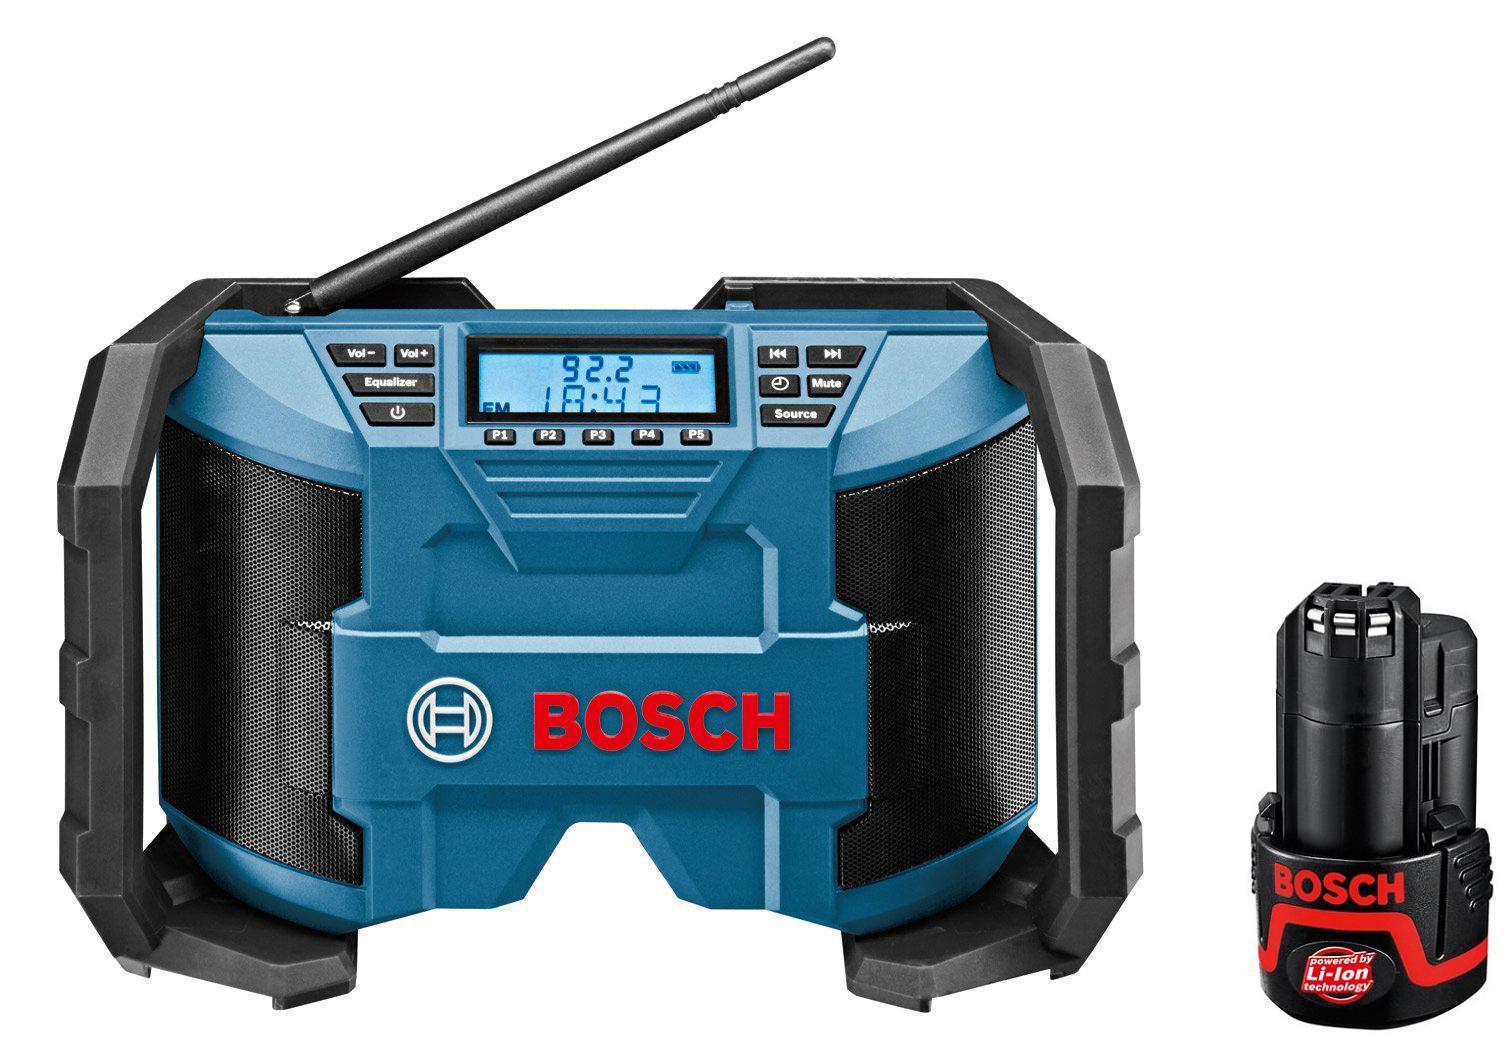 Набор Bosch Радио gml 10.8 v-li (0.601.429.200) +Аккумулятор 12В 2.0Ач liion (1.600.z00.02x)